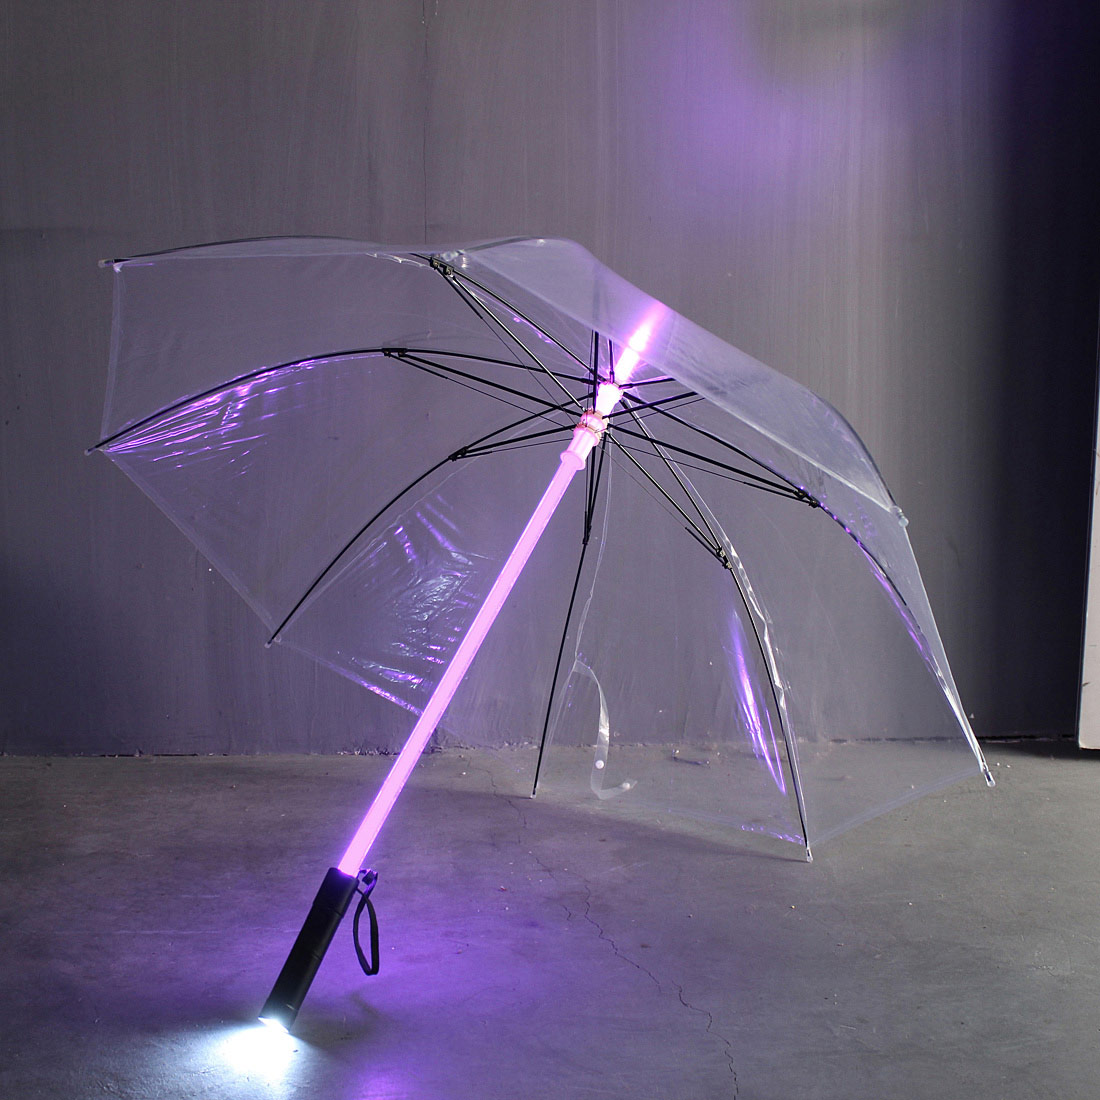 Parapluie Lumineux Blade Runner Un Must # Image Lumineux